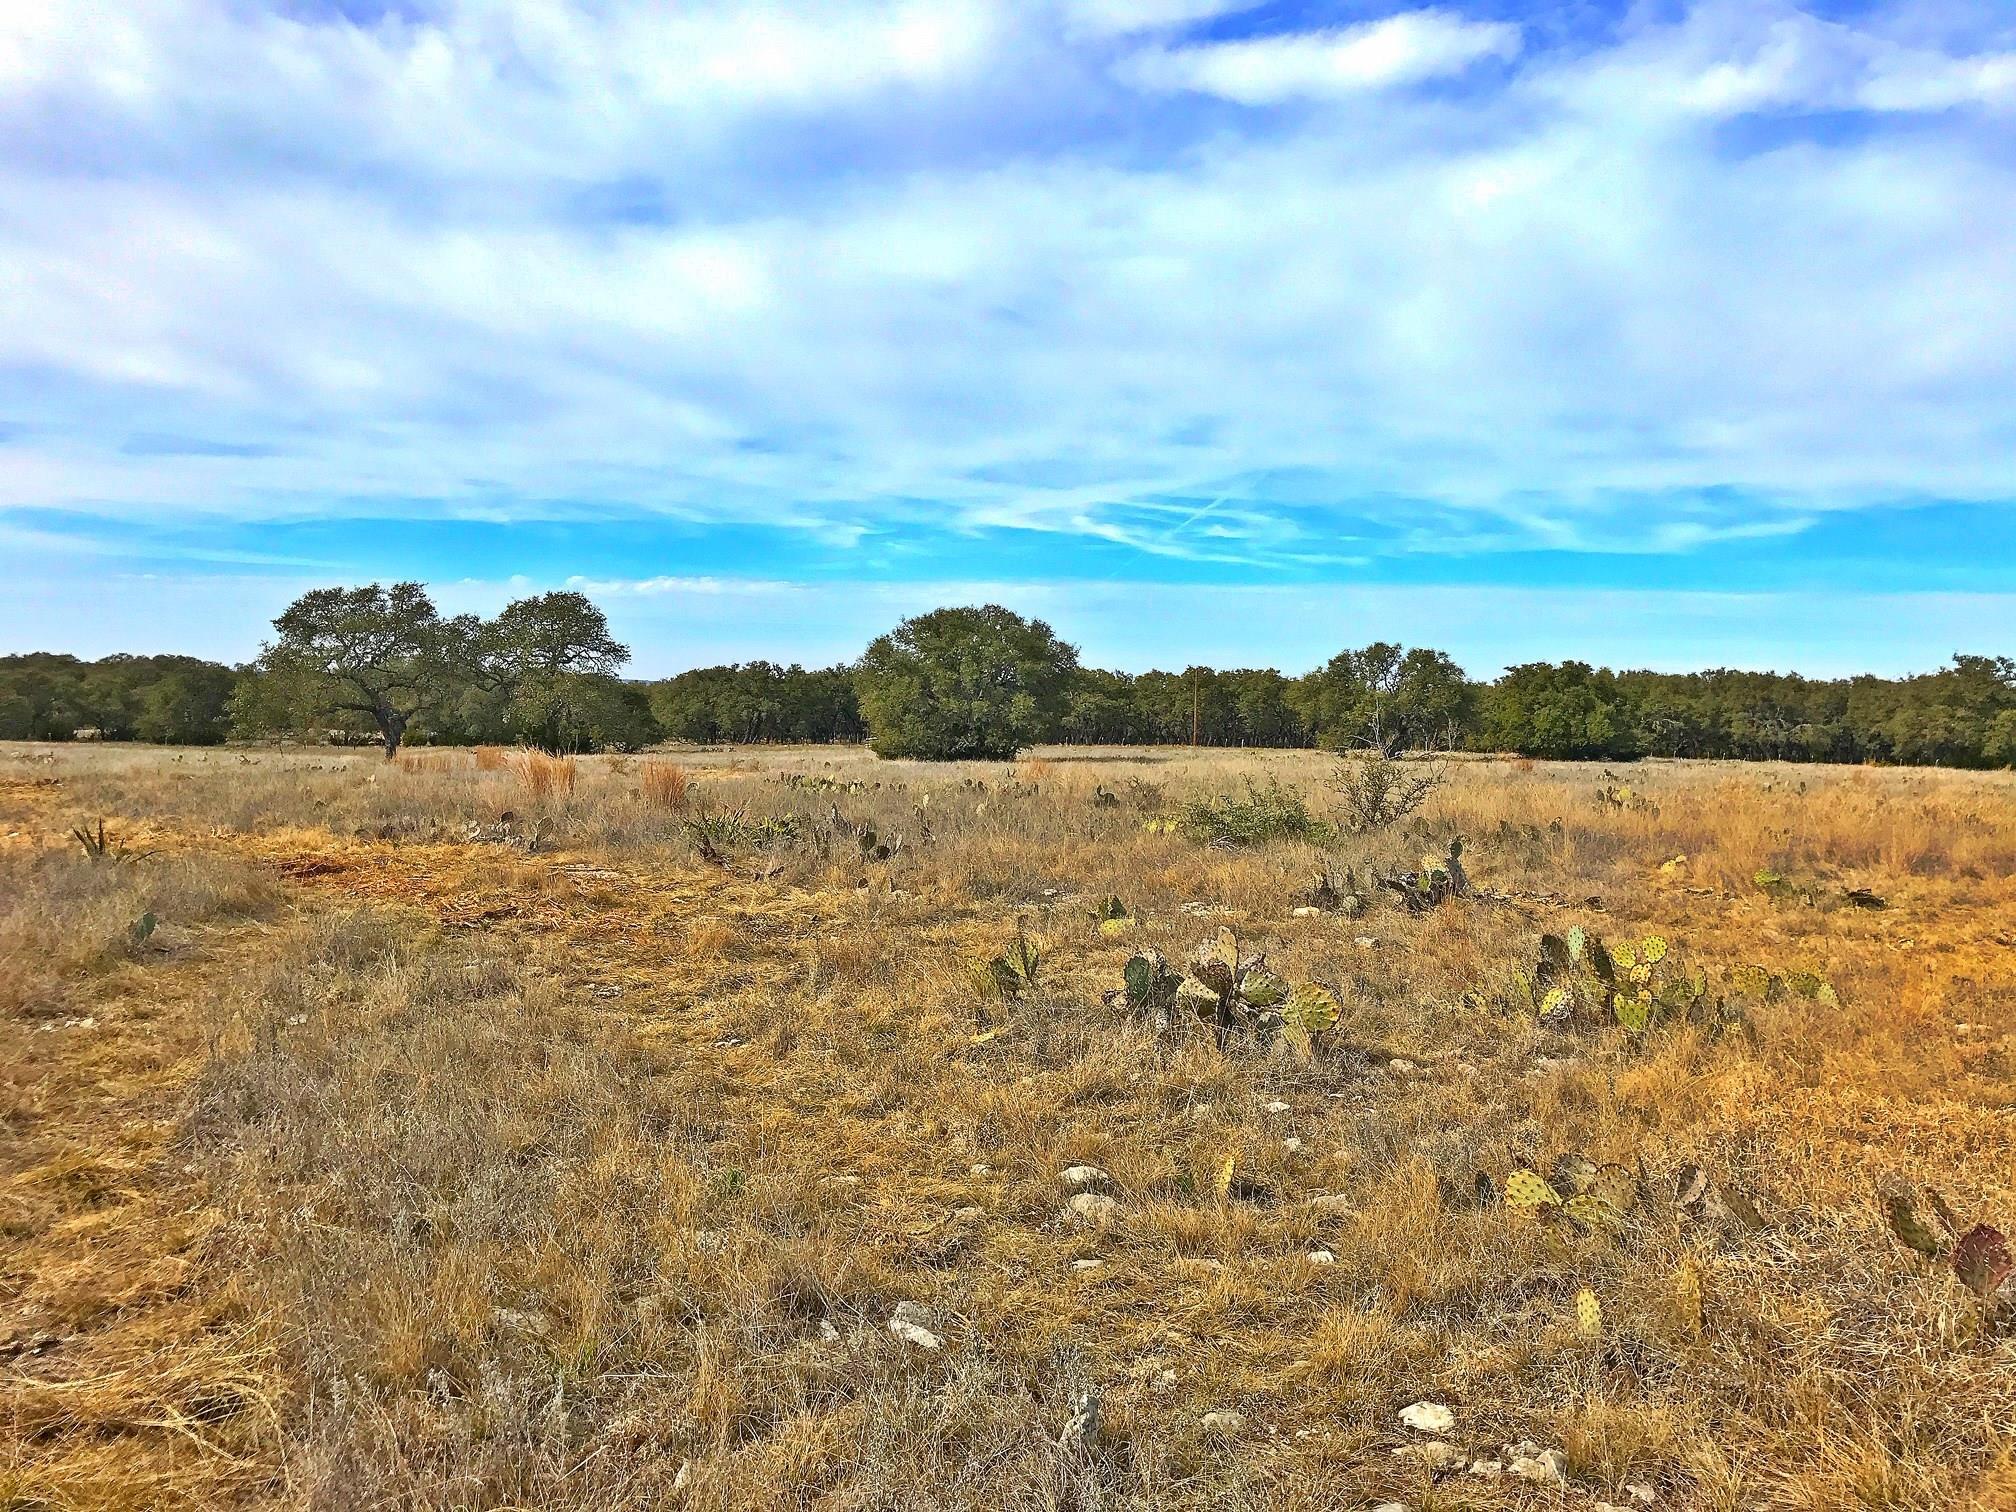 000 Kudu Court Property Photo - Lampasas, TX real estate listing